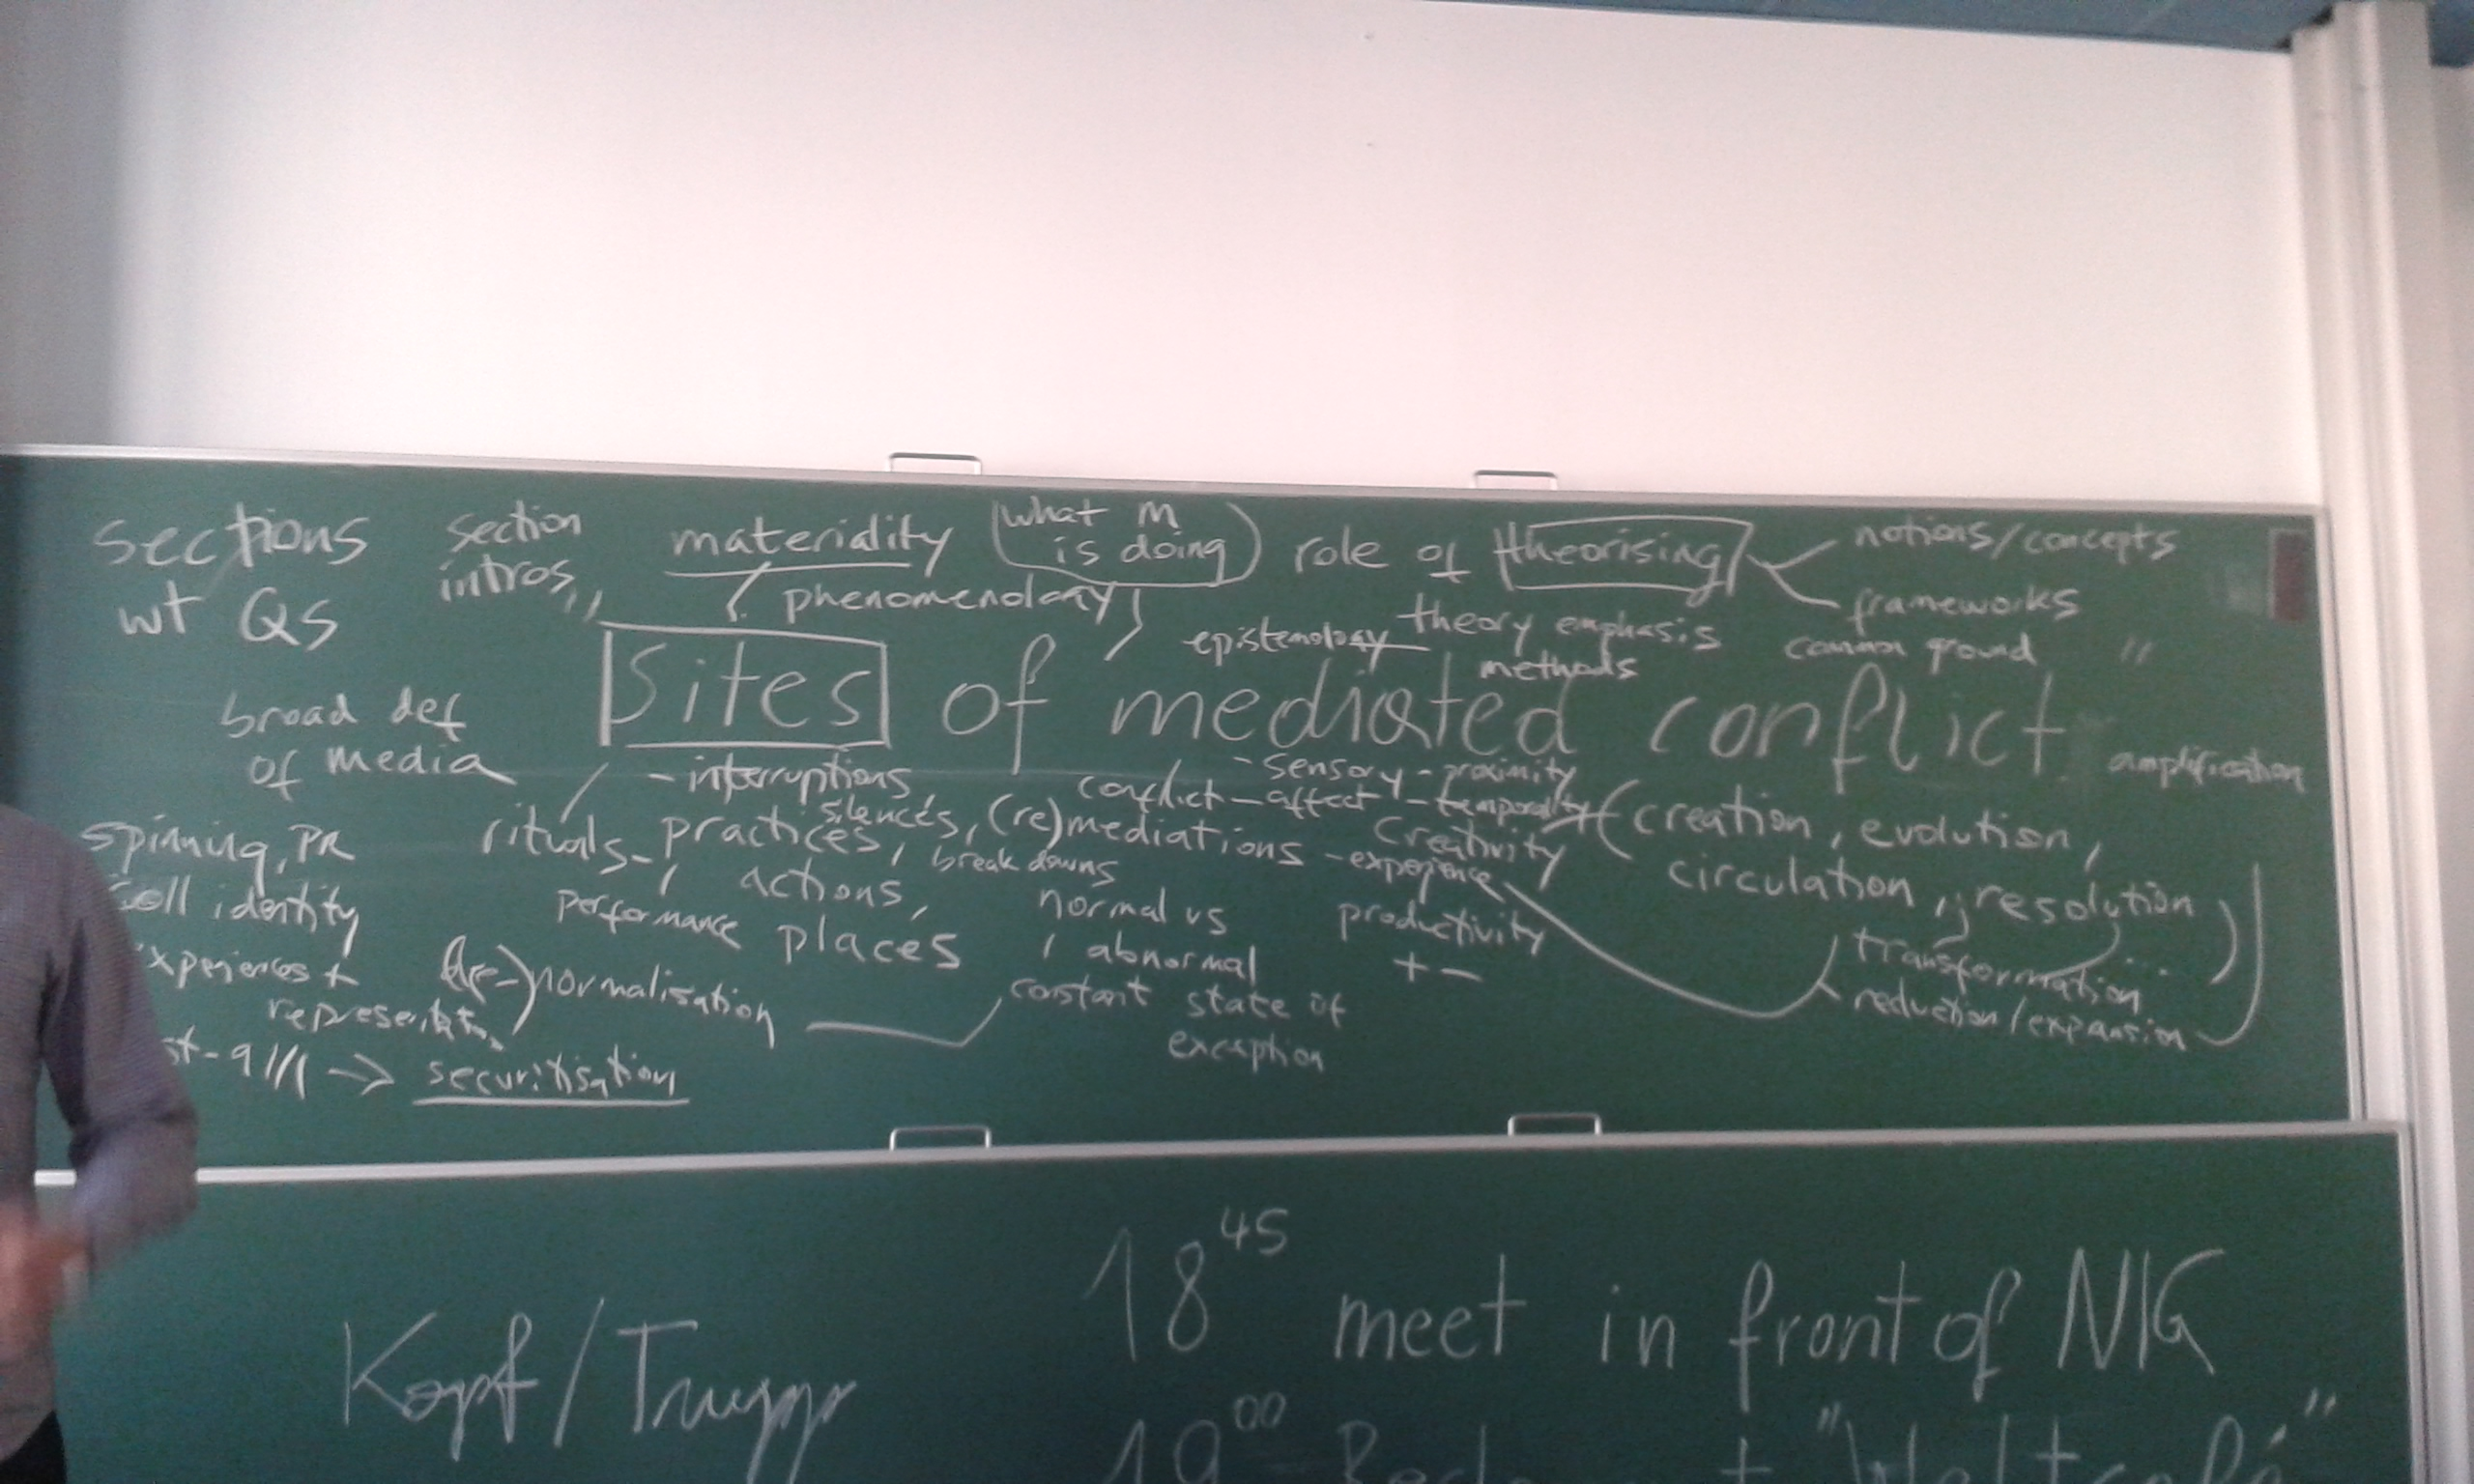 blackboard 2 - sites of mediated conflict